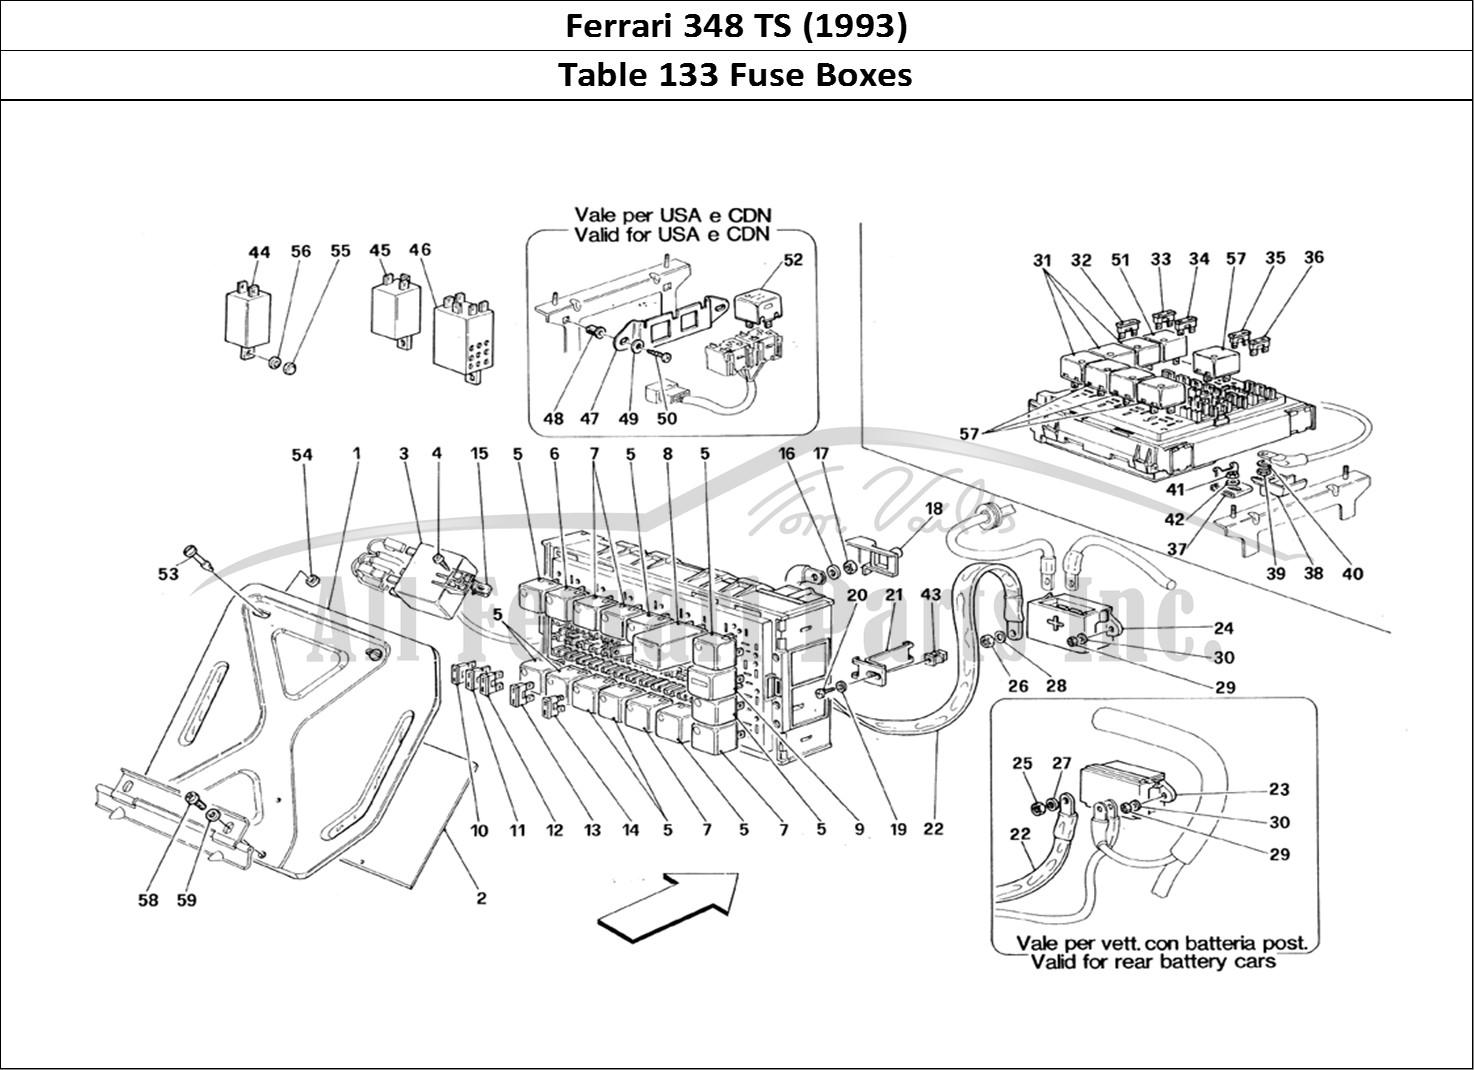 Buy original Ferrari 348 TS (1993) 133 Fuse Boxes Ferrari